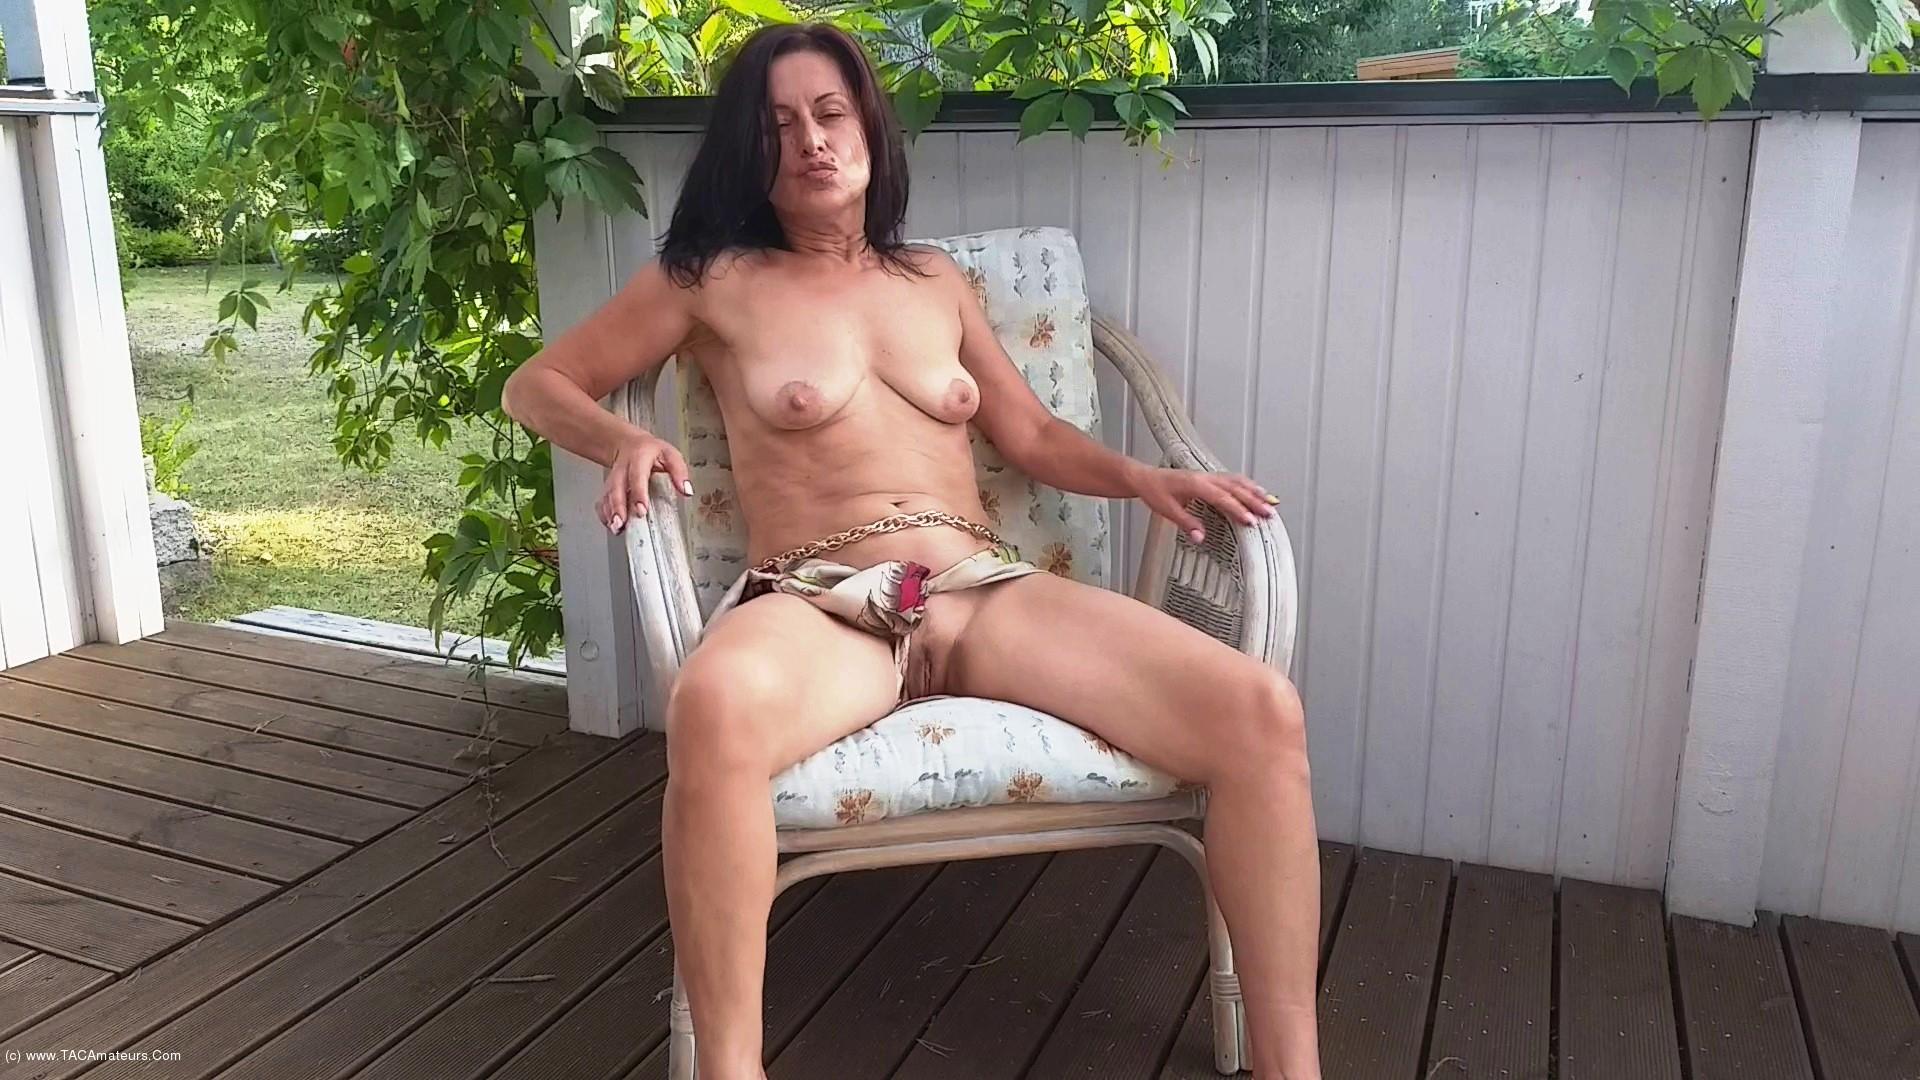 DianaAnanta - Outdoor Masturbation scene 1